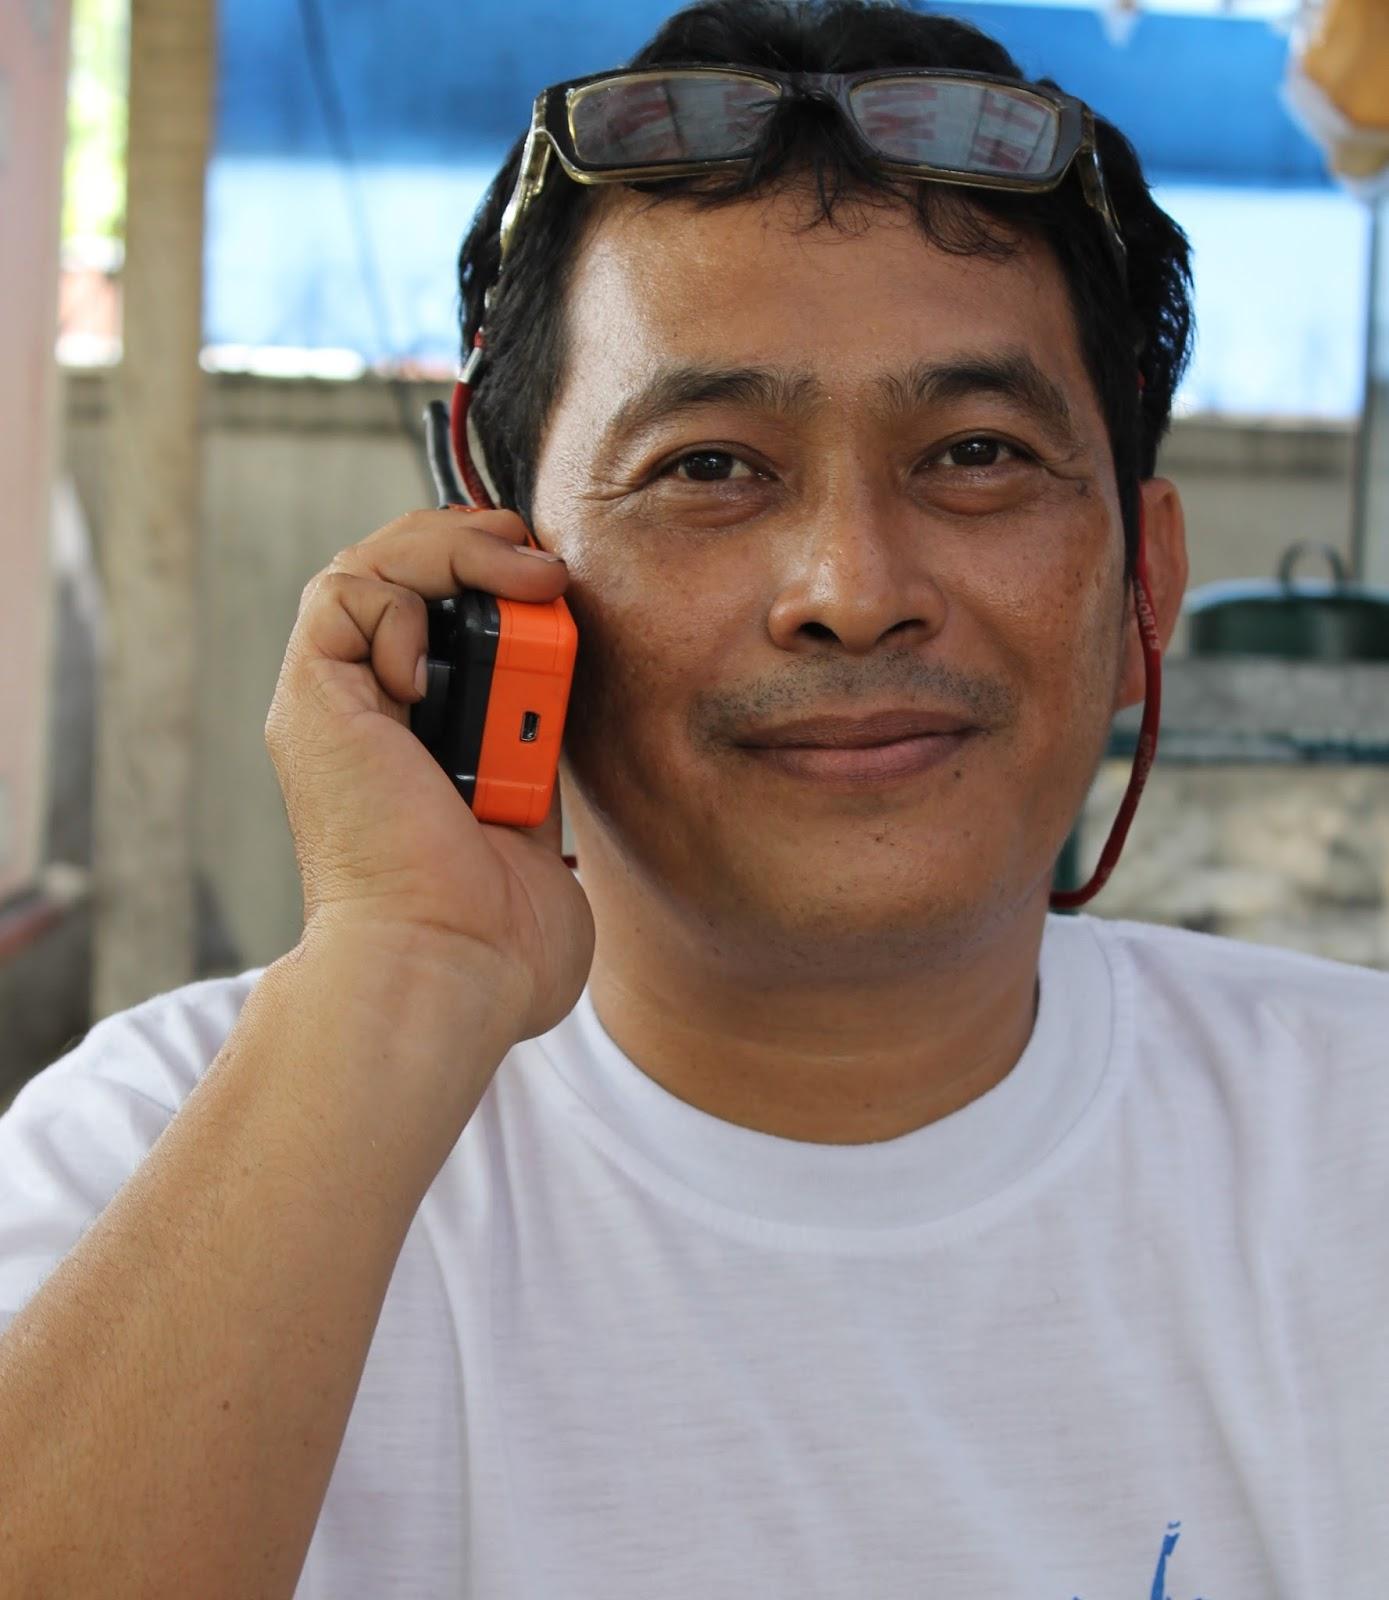 RepDem Desak Jokowi Jalankan Reforma Agraria